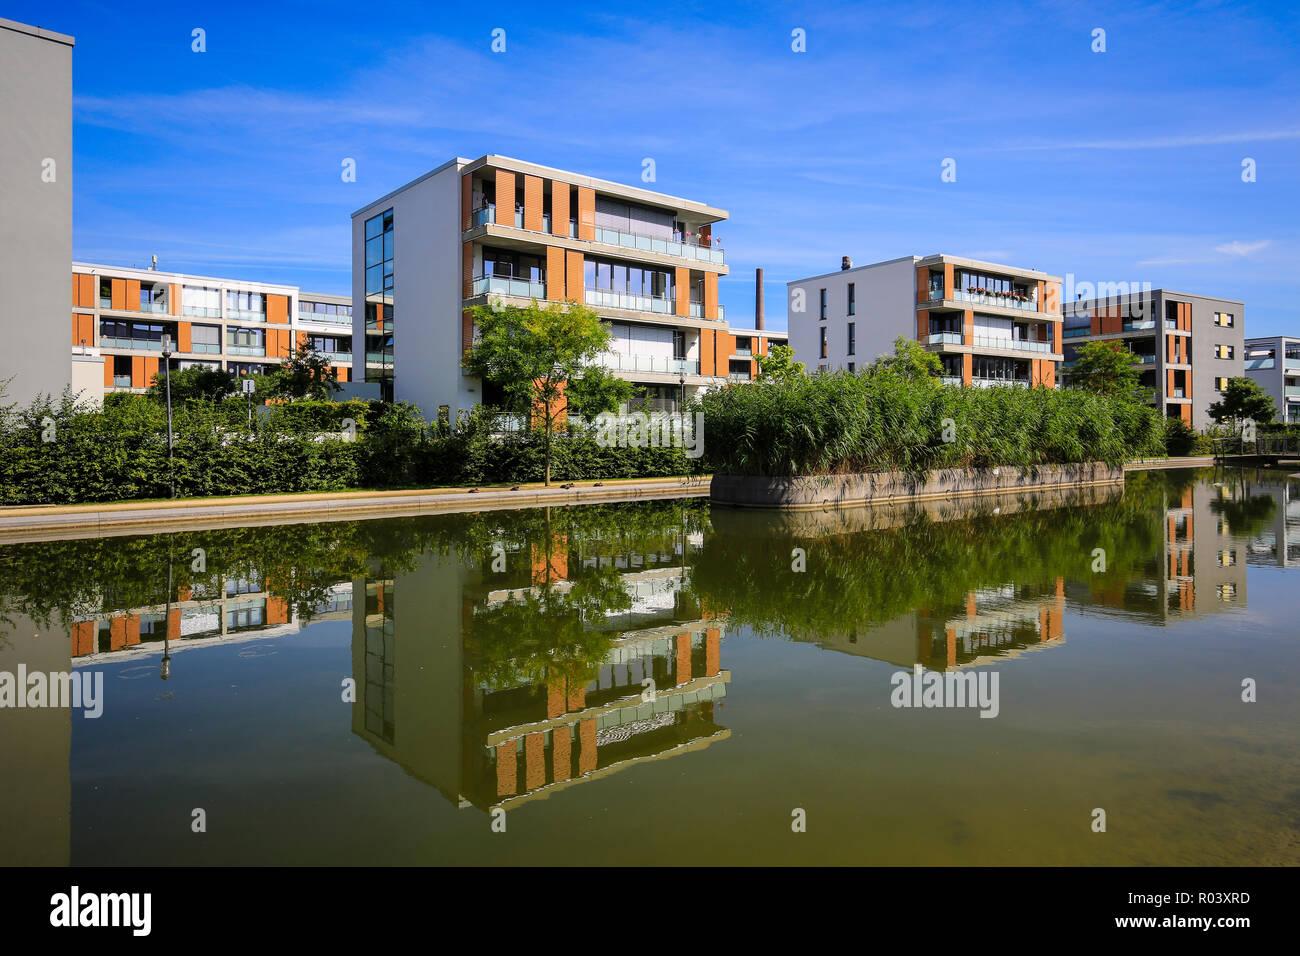 Essen, Ruhr area, Germany, urban development project Gruene Mitte Essen, new district at Uni-Park - Stock Image